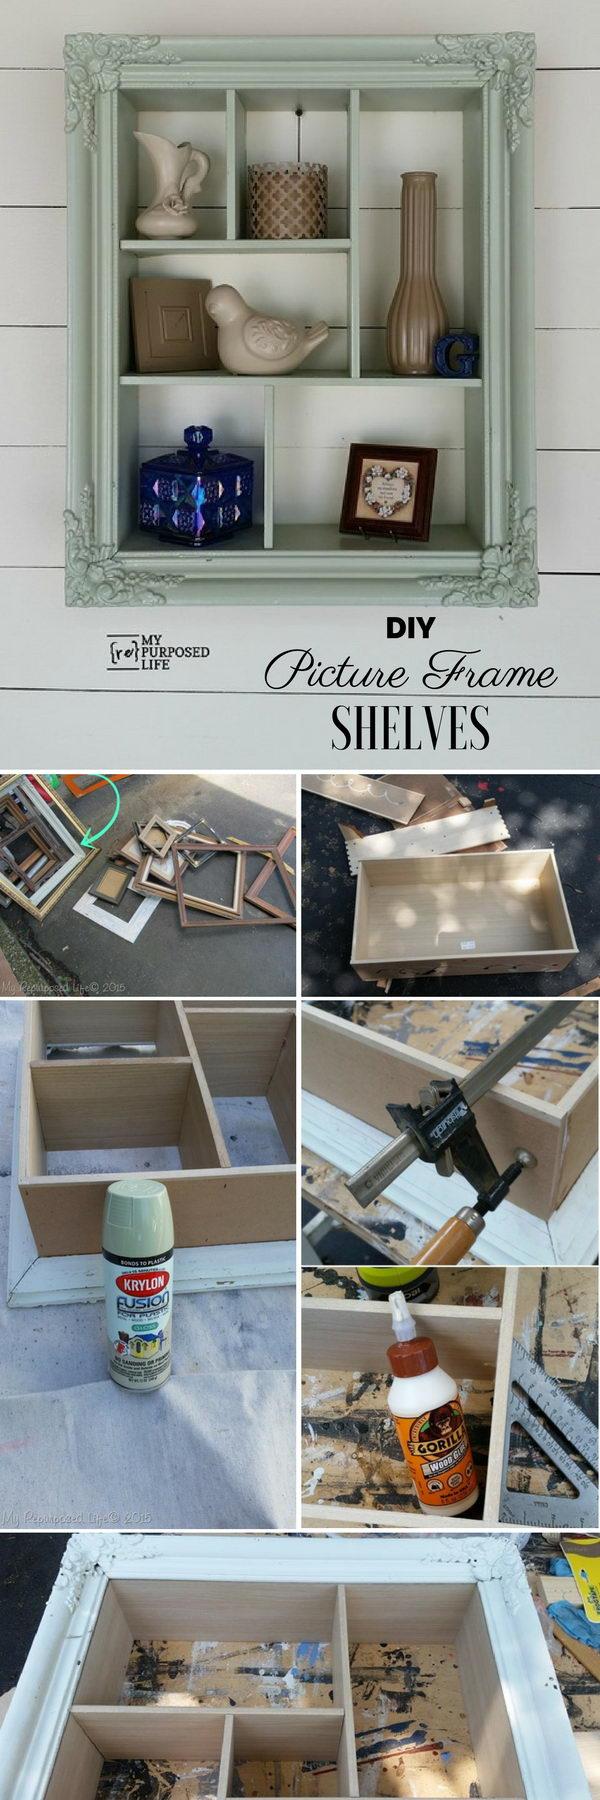 Picture Frame Shelves.